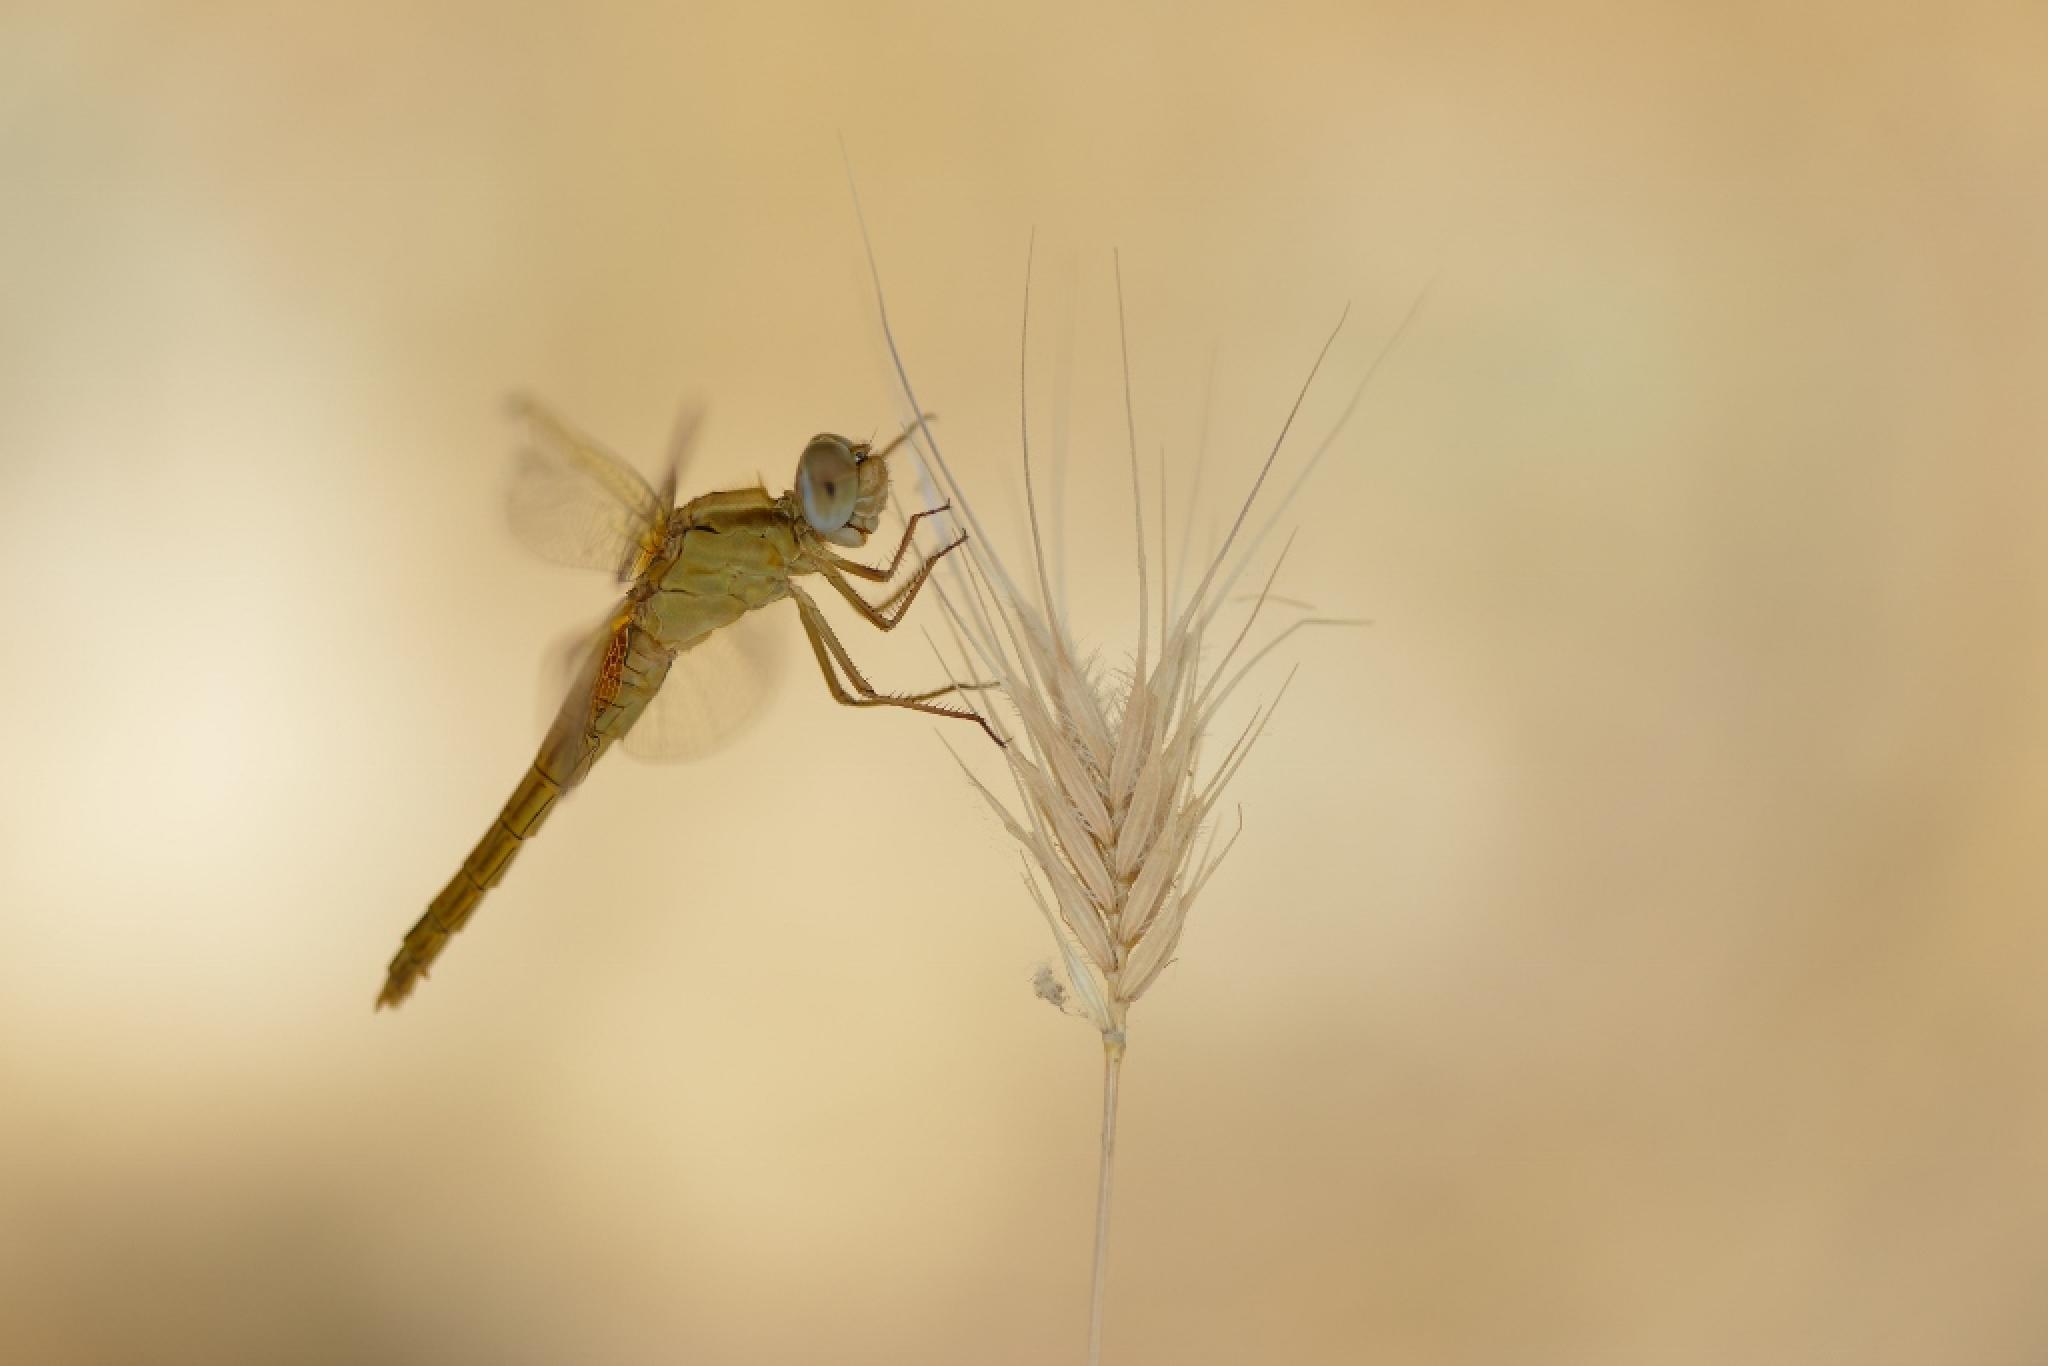 dragonfly by Ruurd Visser